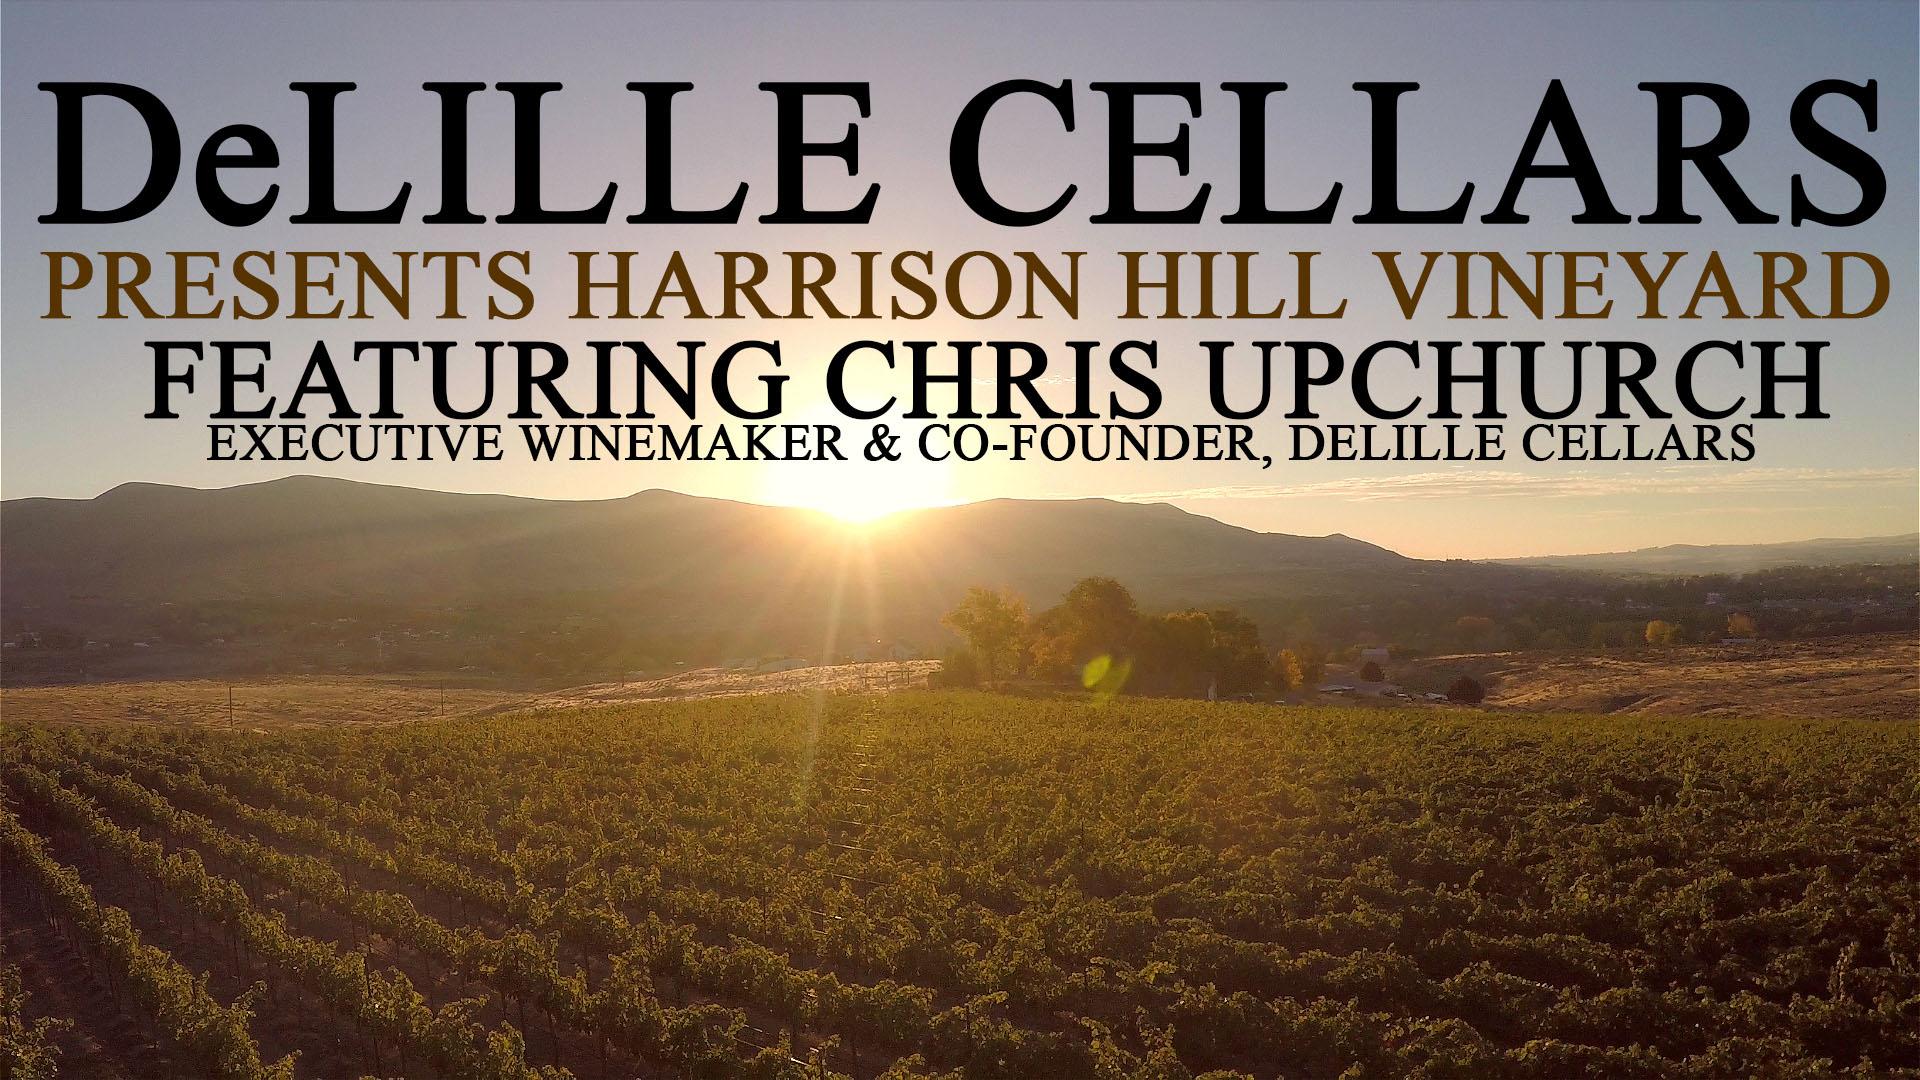 DeLille Cellars Celebrates 100 Years of Harrison Hill Vineyard